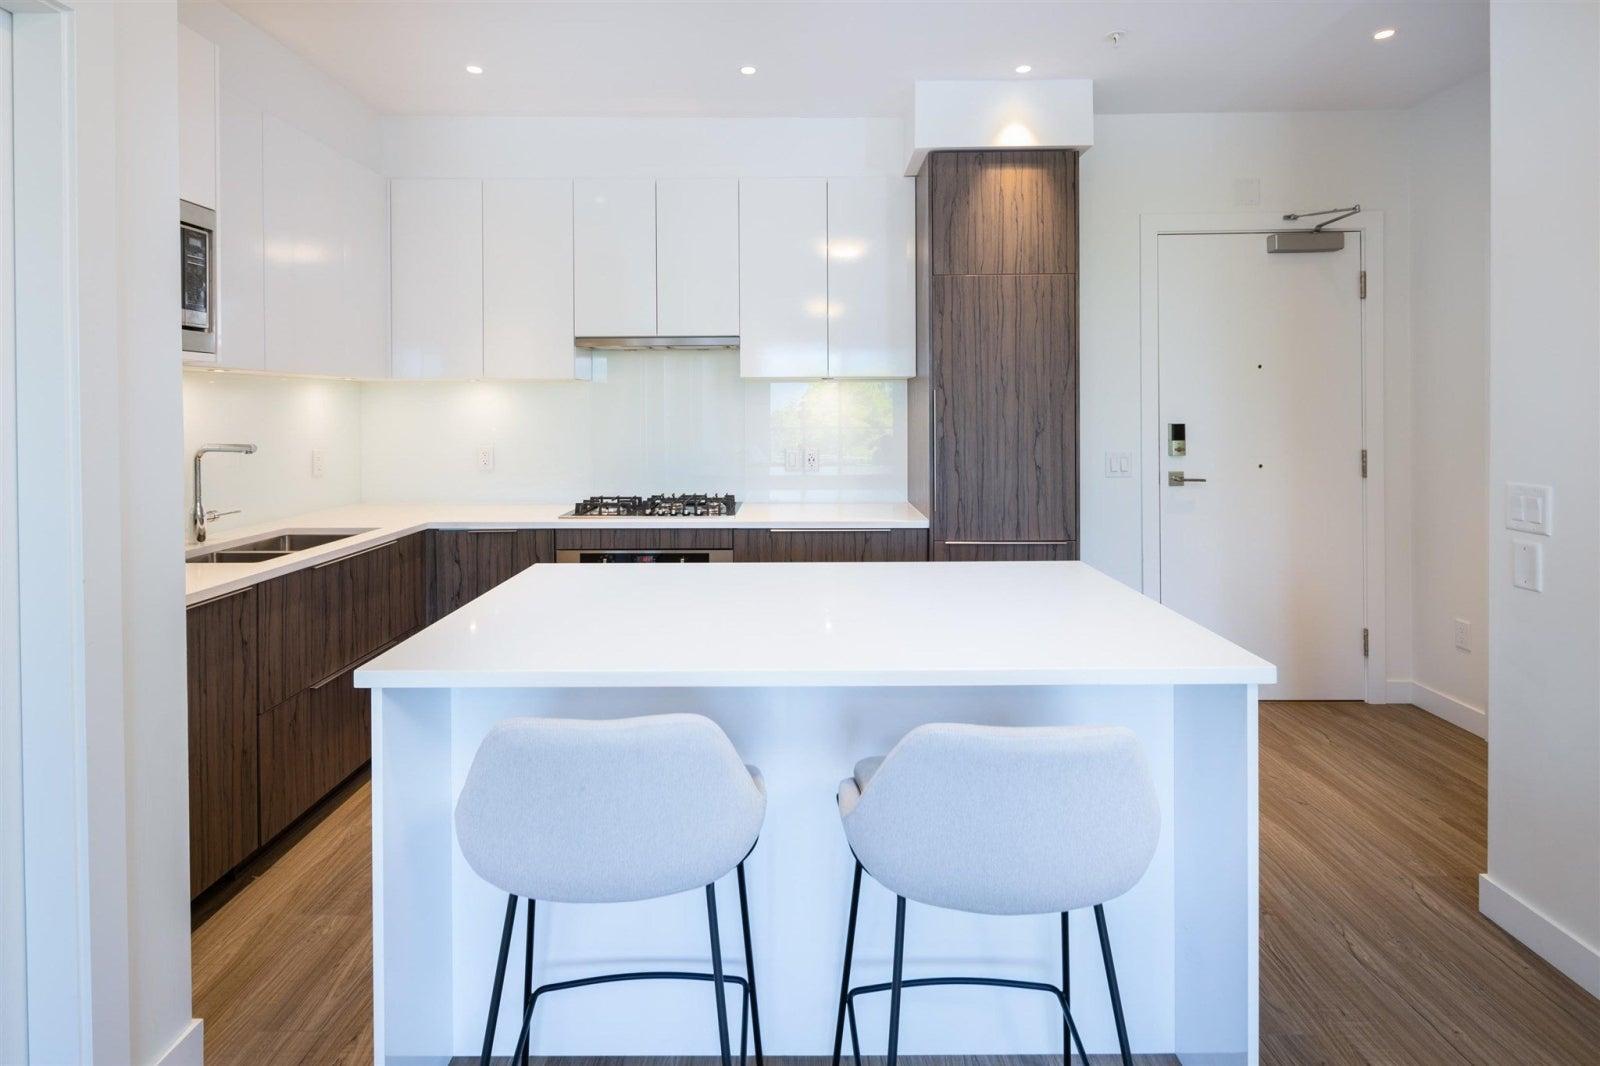 408 379 E BROADWAY AVENUE - Mount Pleasant VE Apartment/Condo for sale, 2 Bedrooms (R2599900) #3